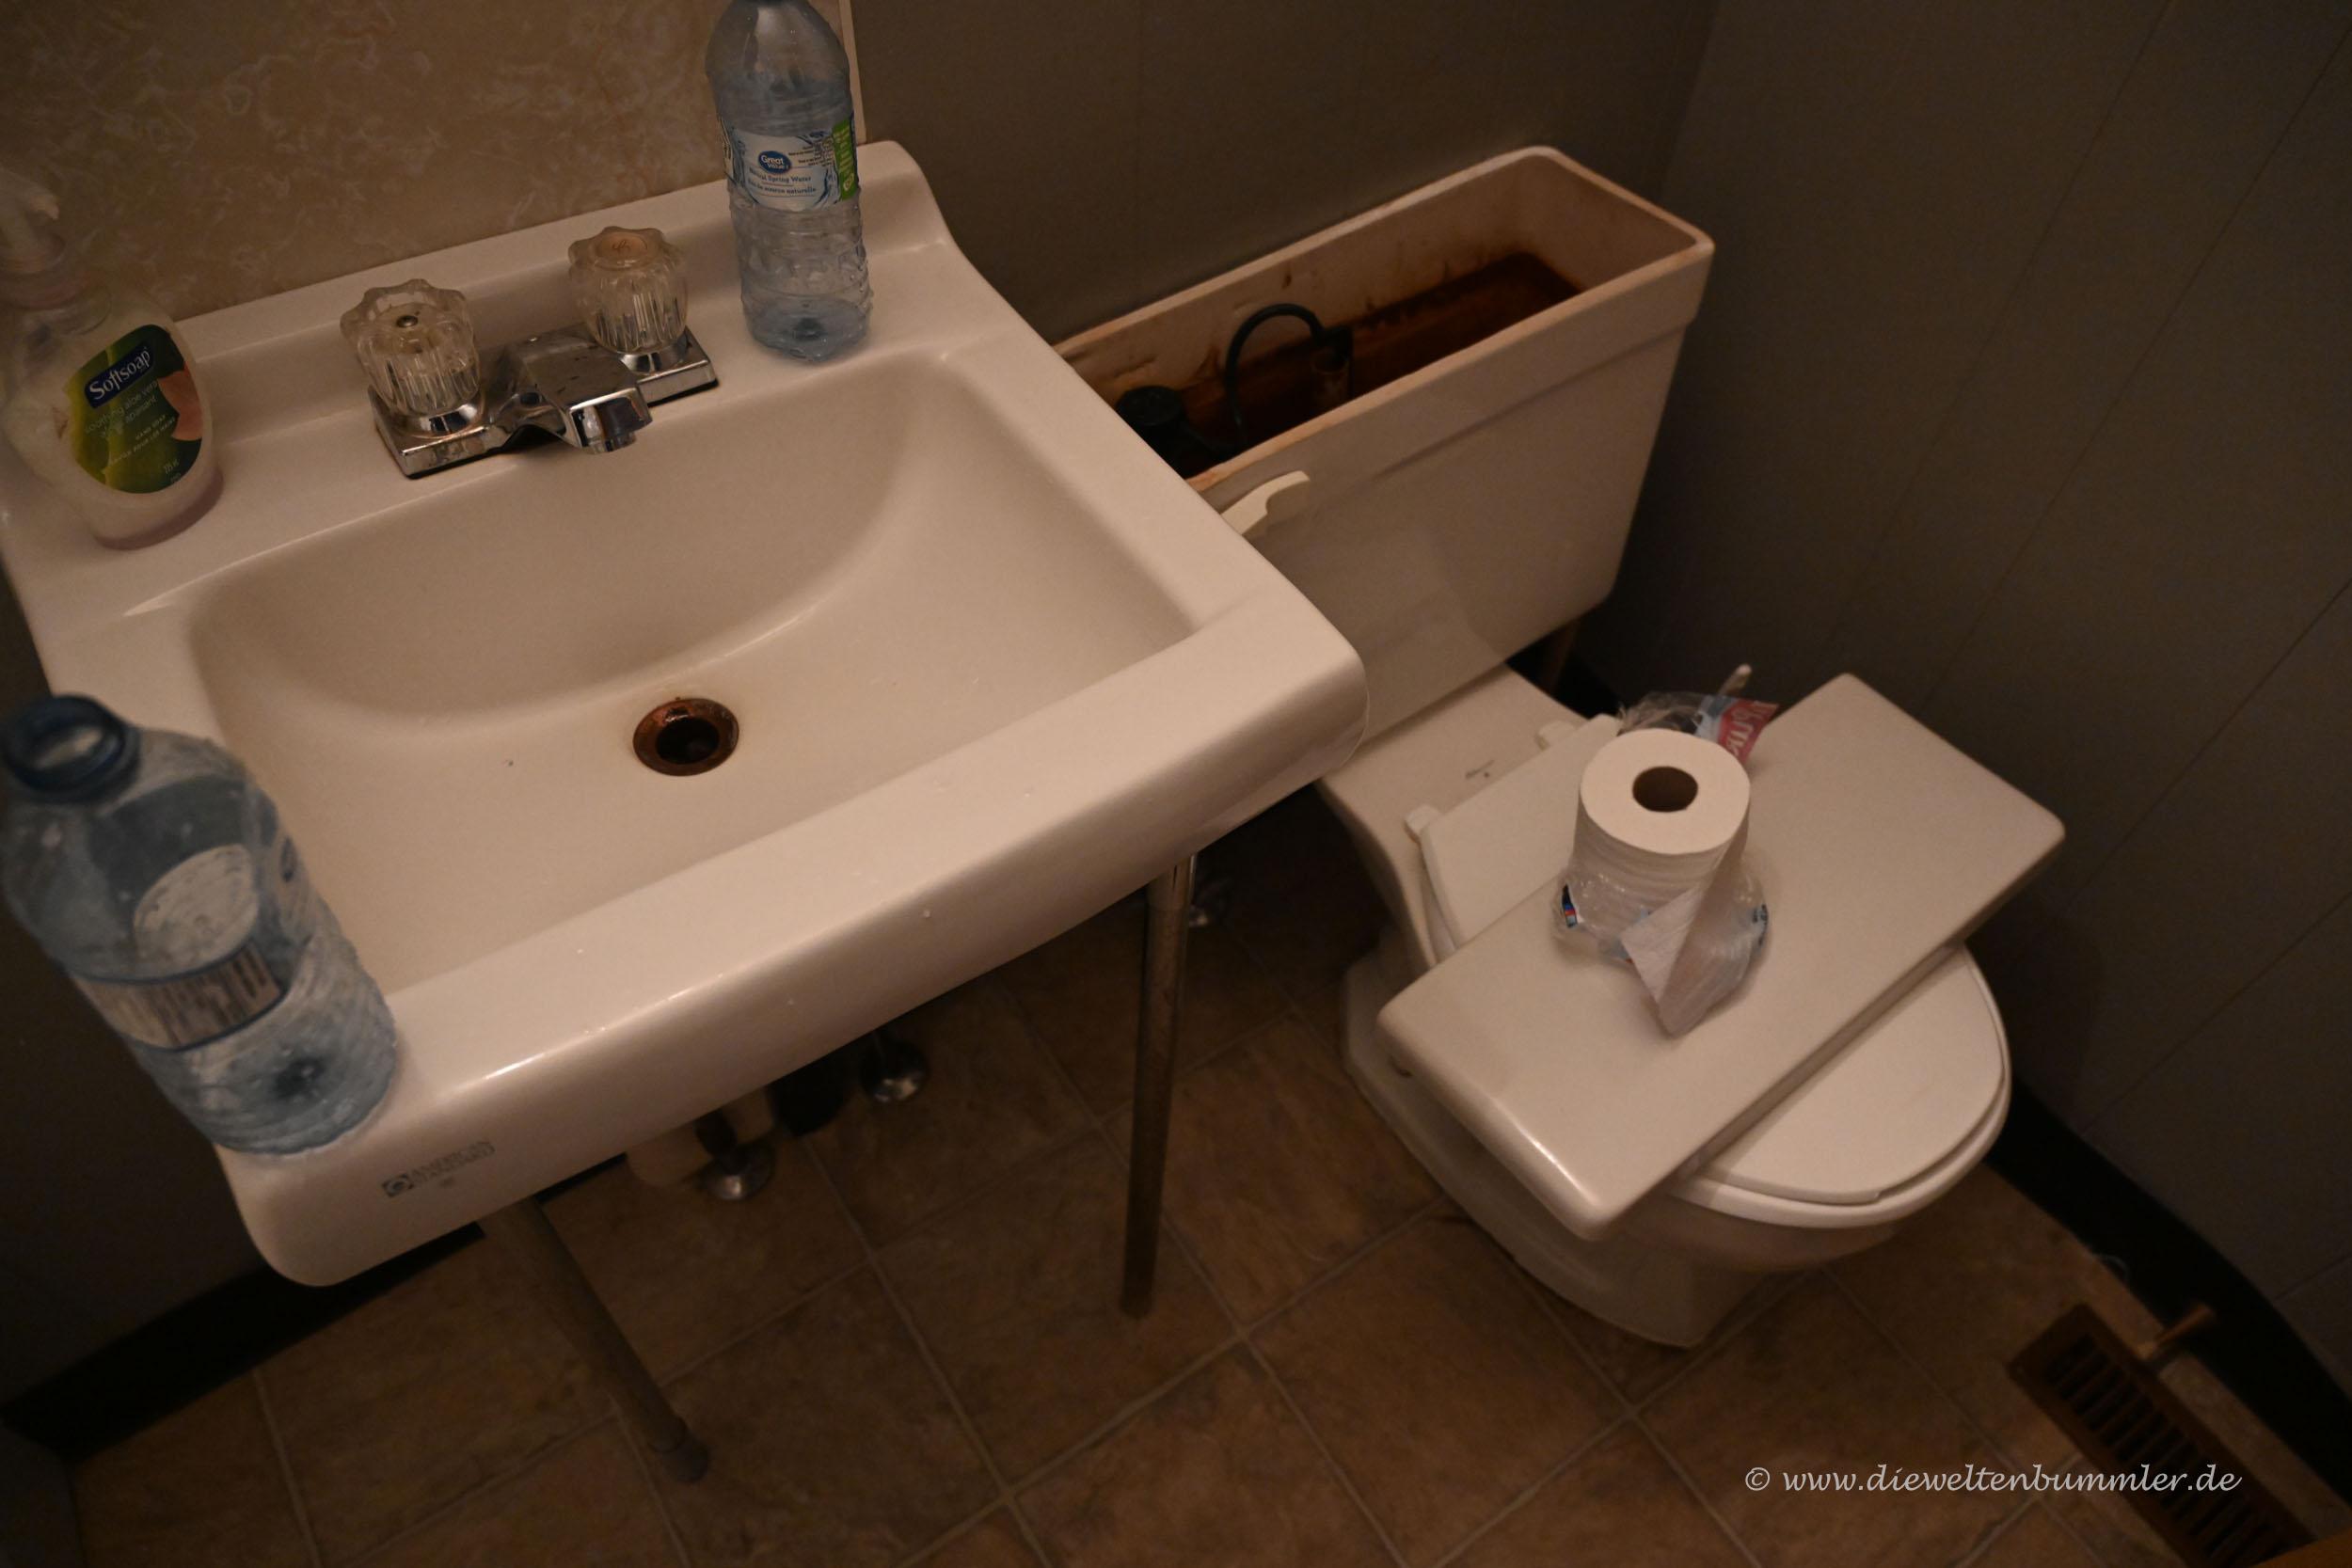 Verdrecktes Wasser im Bad